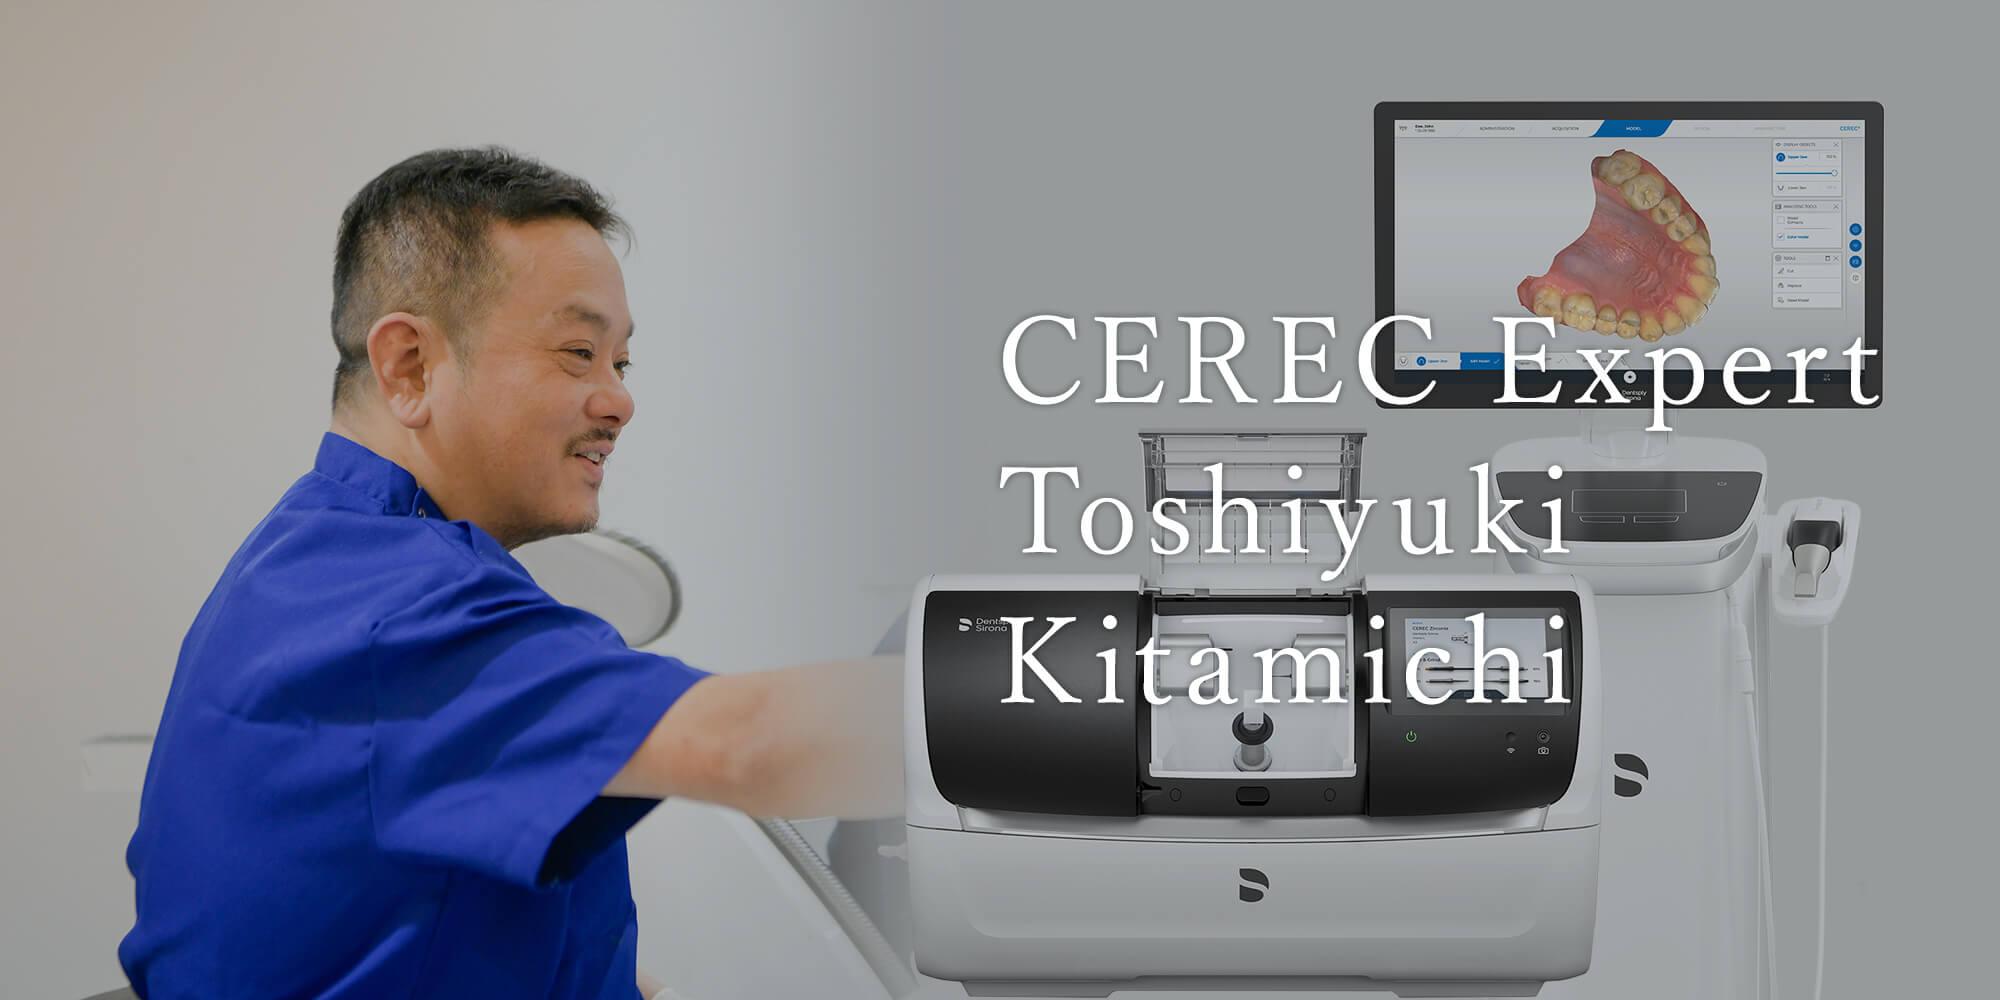 CEREC Expert Toshiyuki Kitamichi